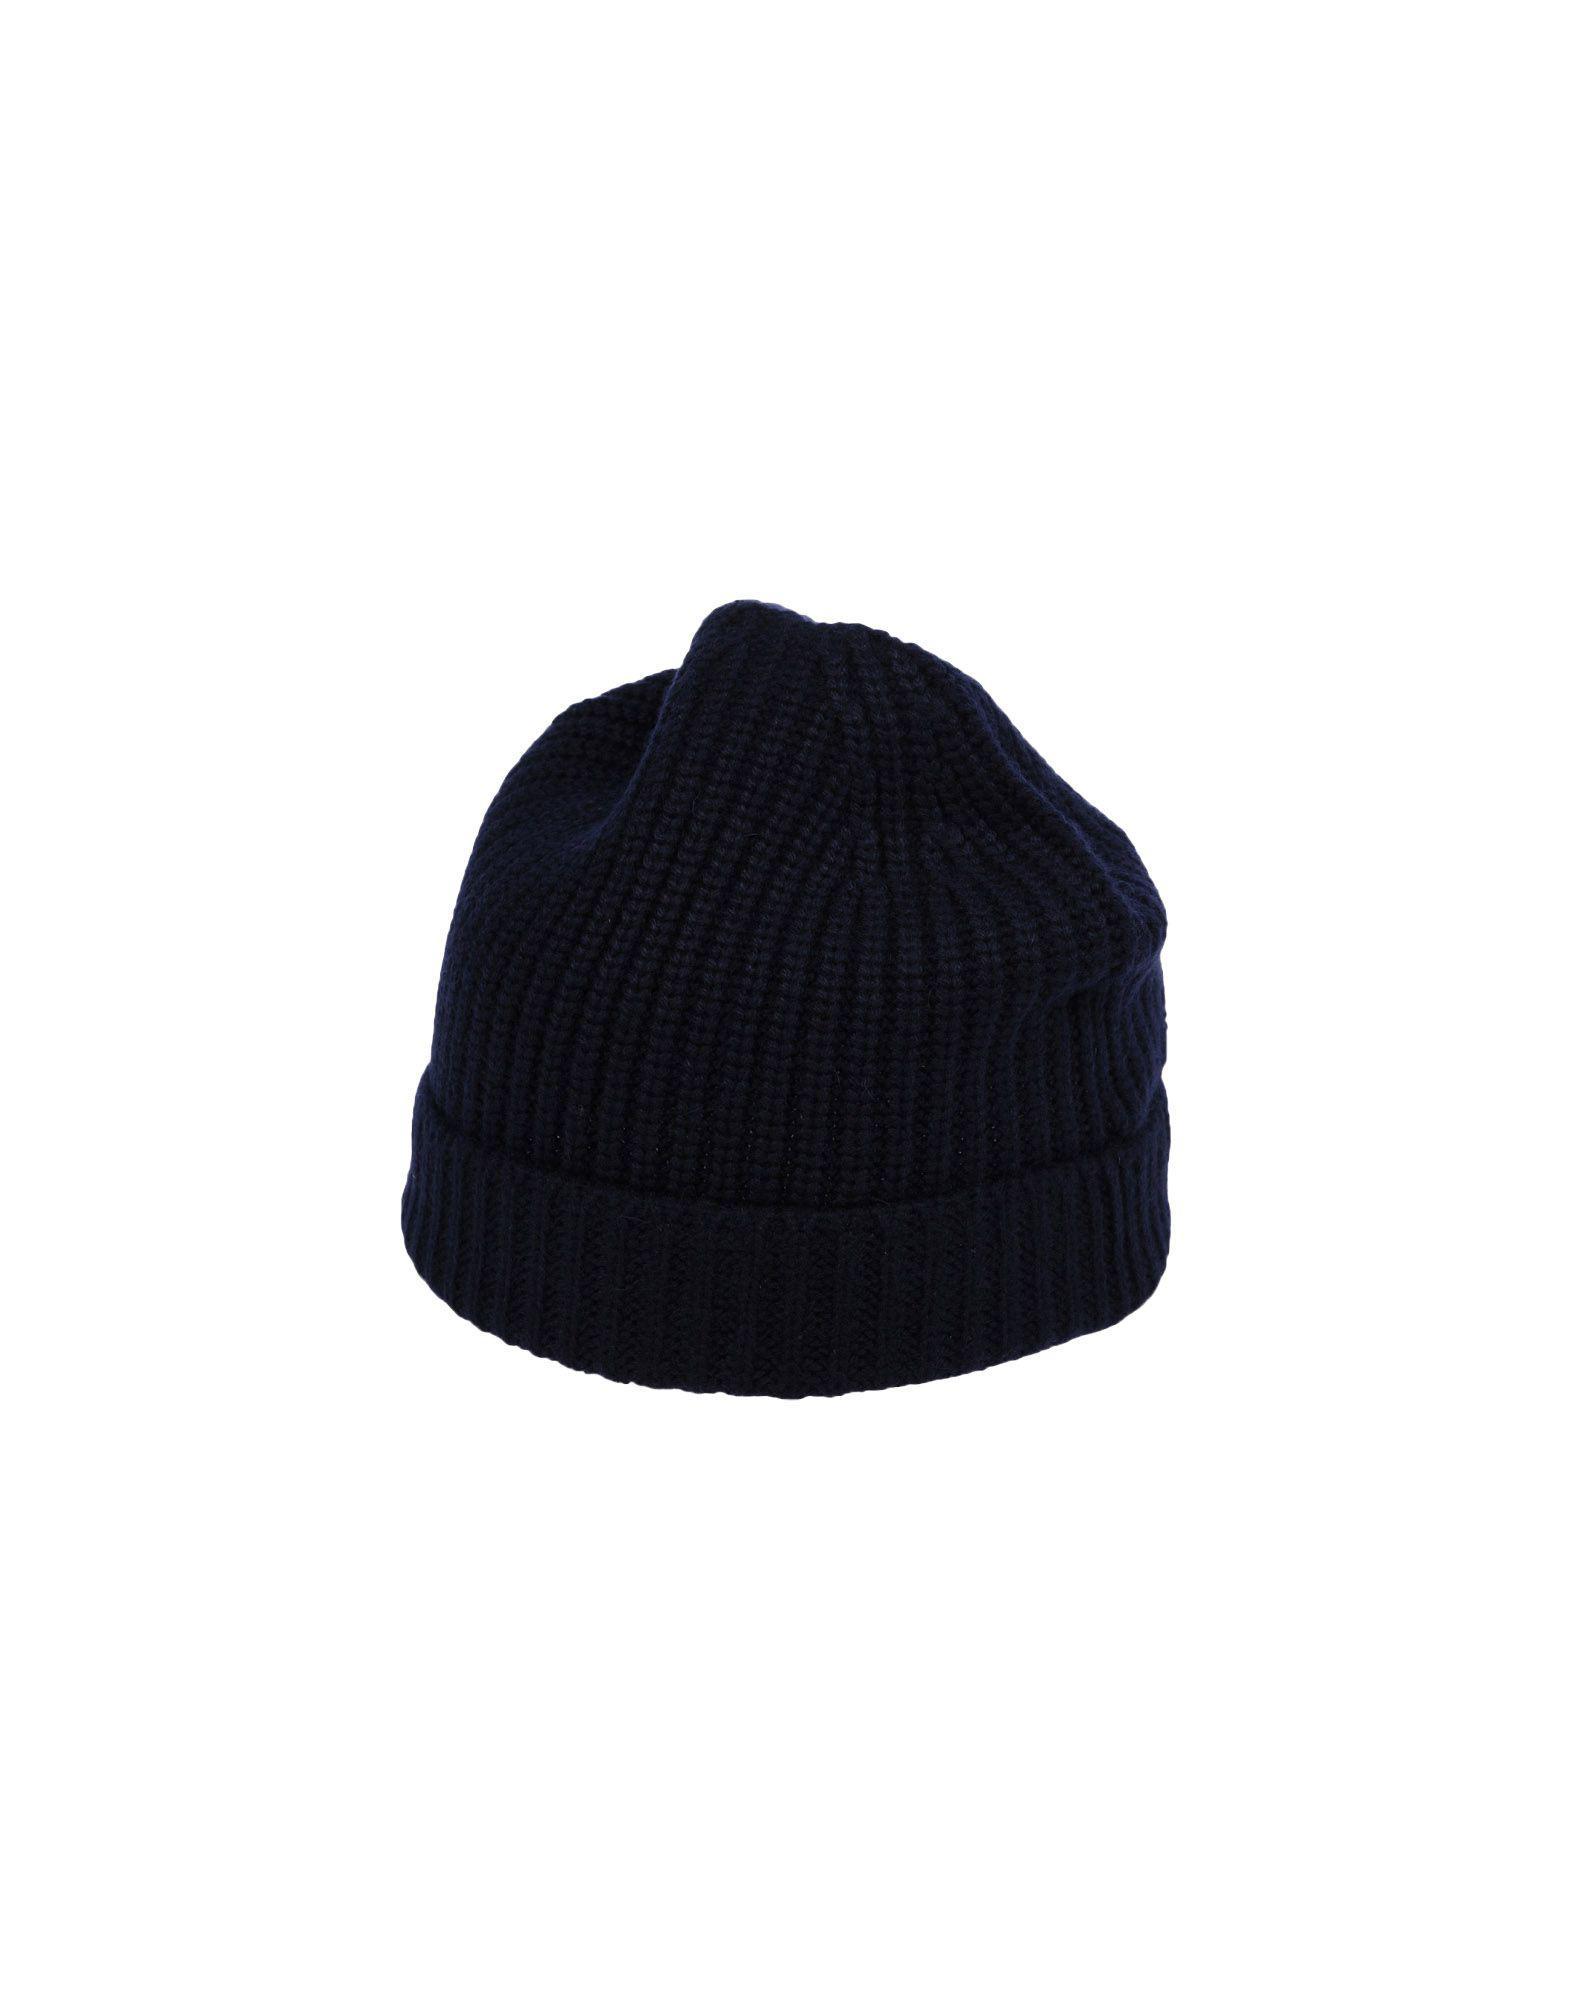 Accesorios - Sombreros Cruciani gA7WxH4l